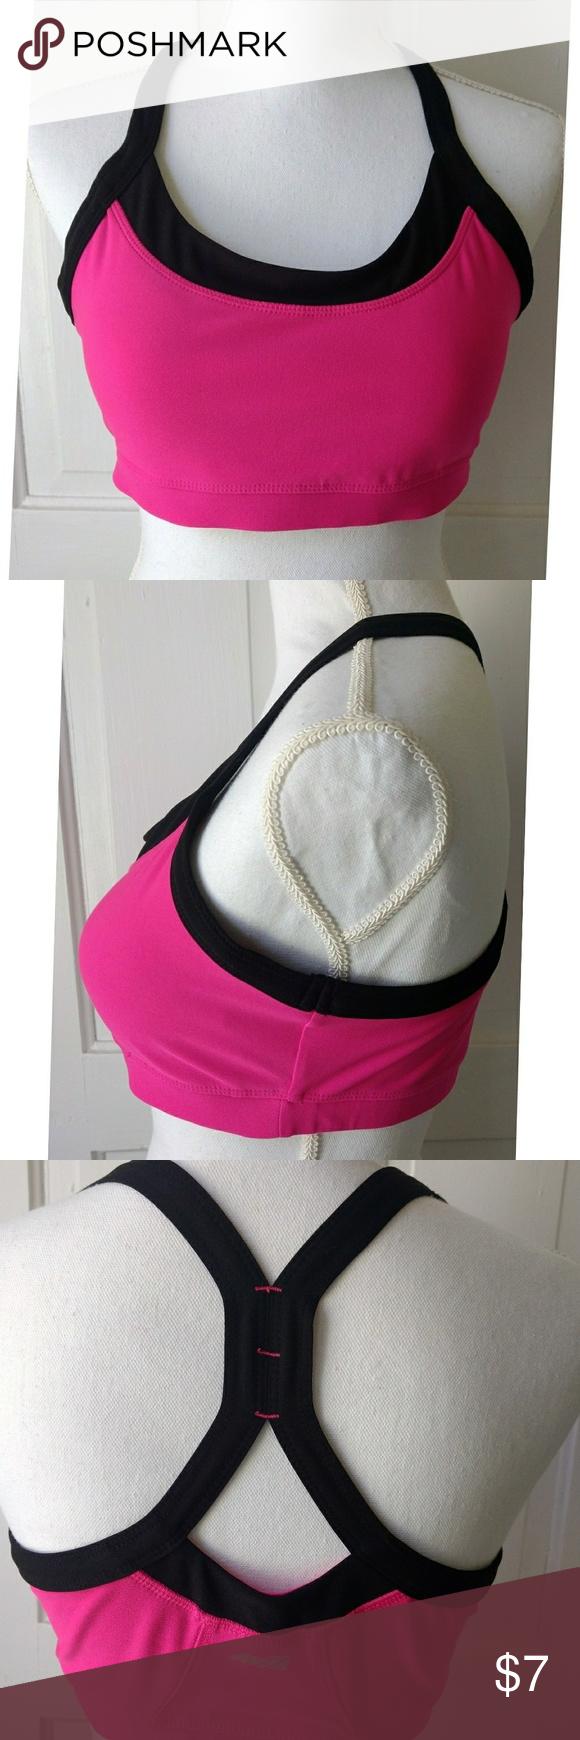 73b8921f32af6 Avia Pink and Black Racerback Sports Bra Size L Bright pink sports bra with  inserts